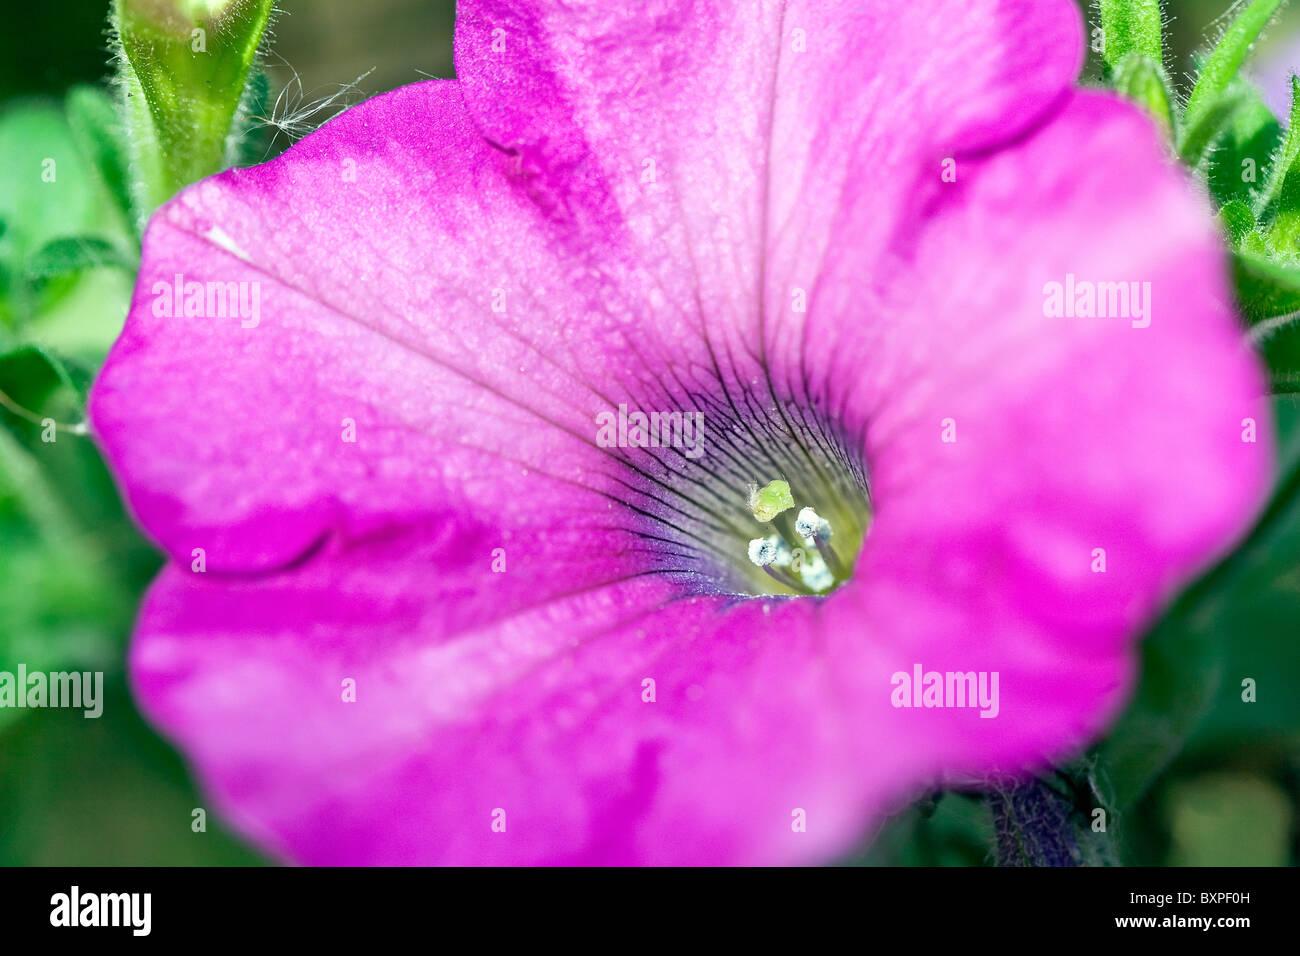 Petunia flower head, close up. - Stock Image